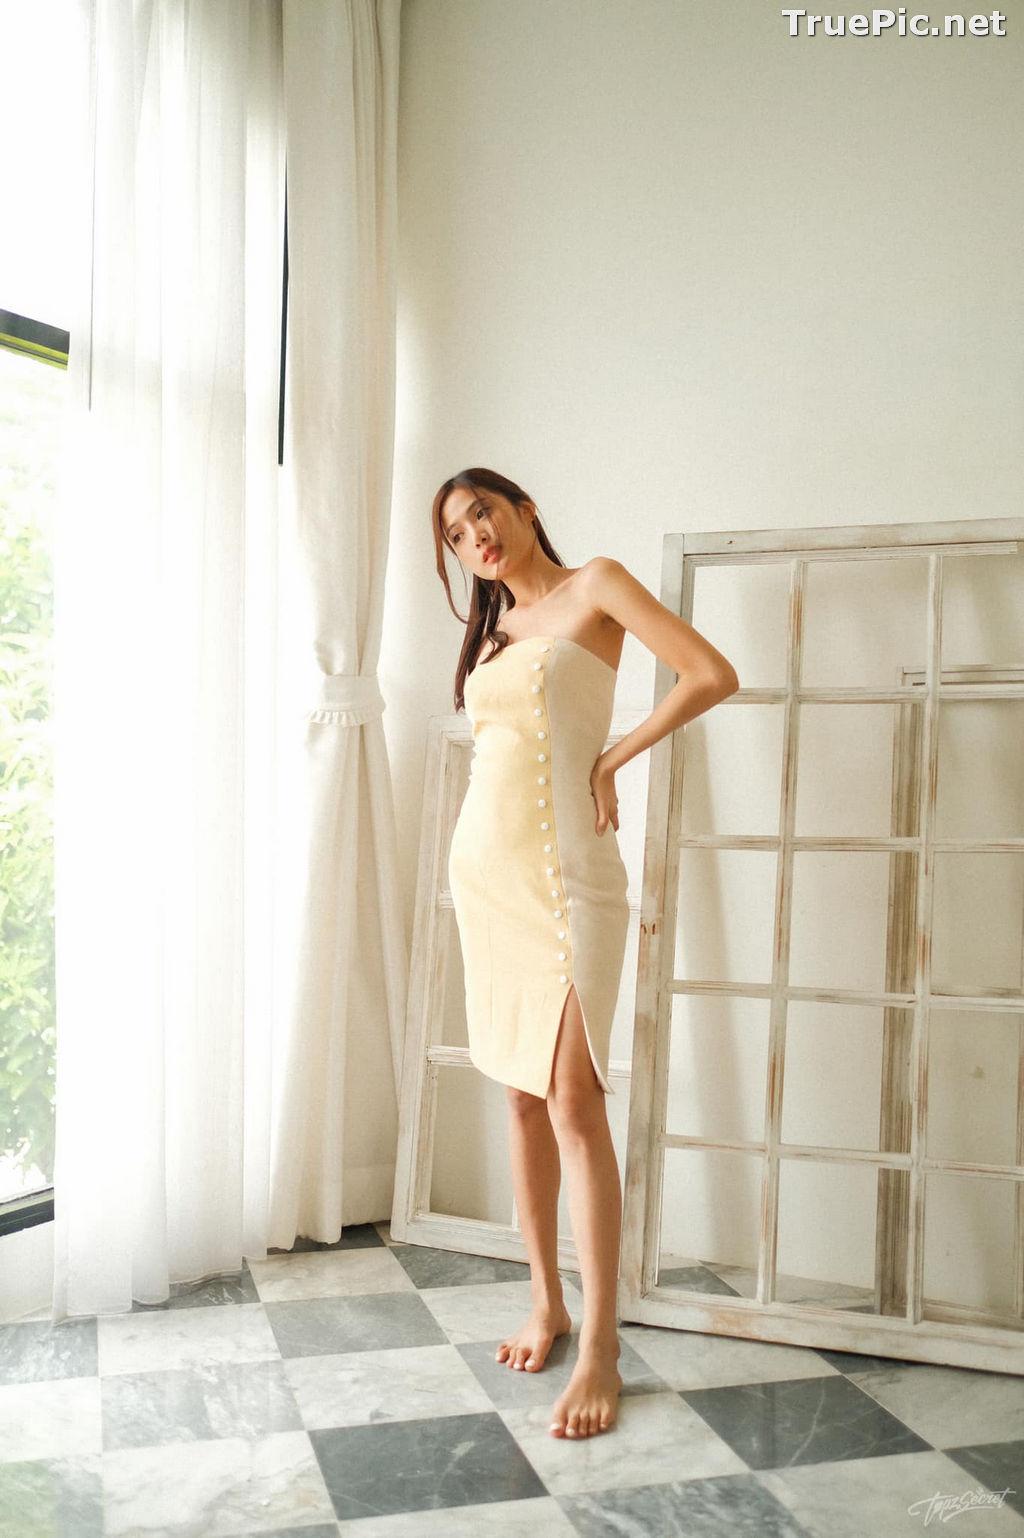 Image Thailand Model - Weeraya Sukaram - Concept Bodycon Dresses - TruePic.net - Picture-7